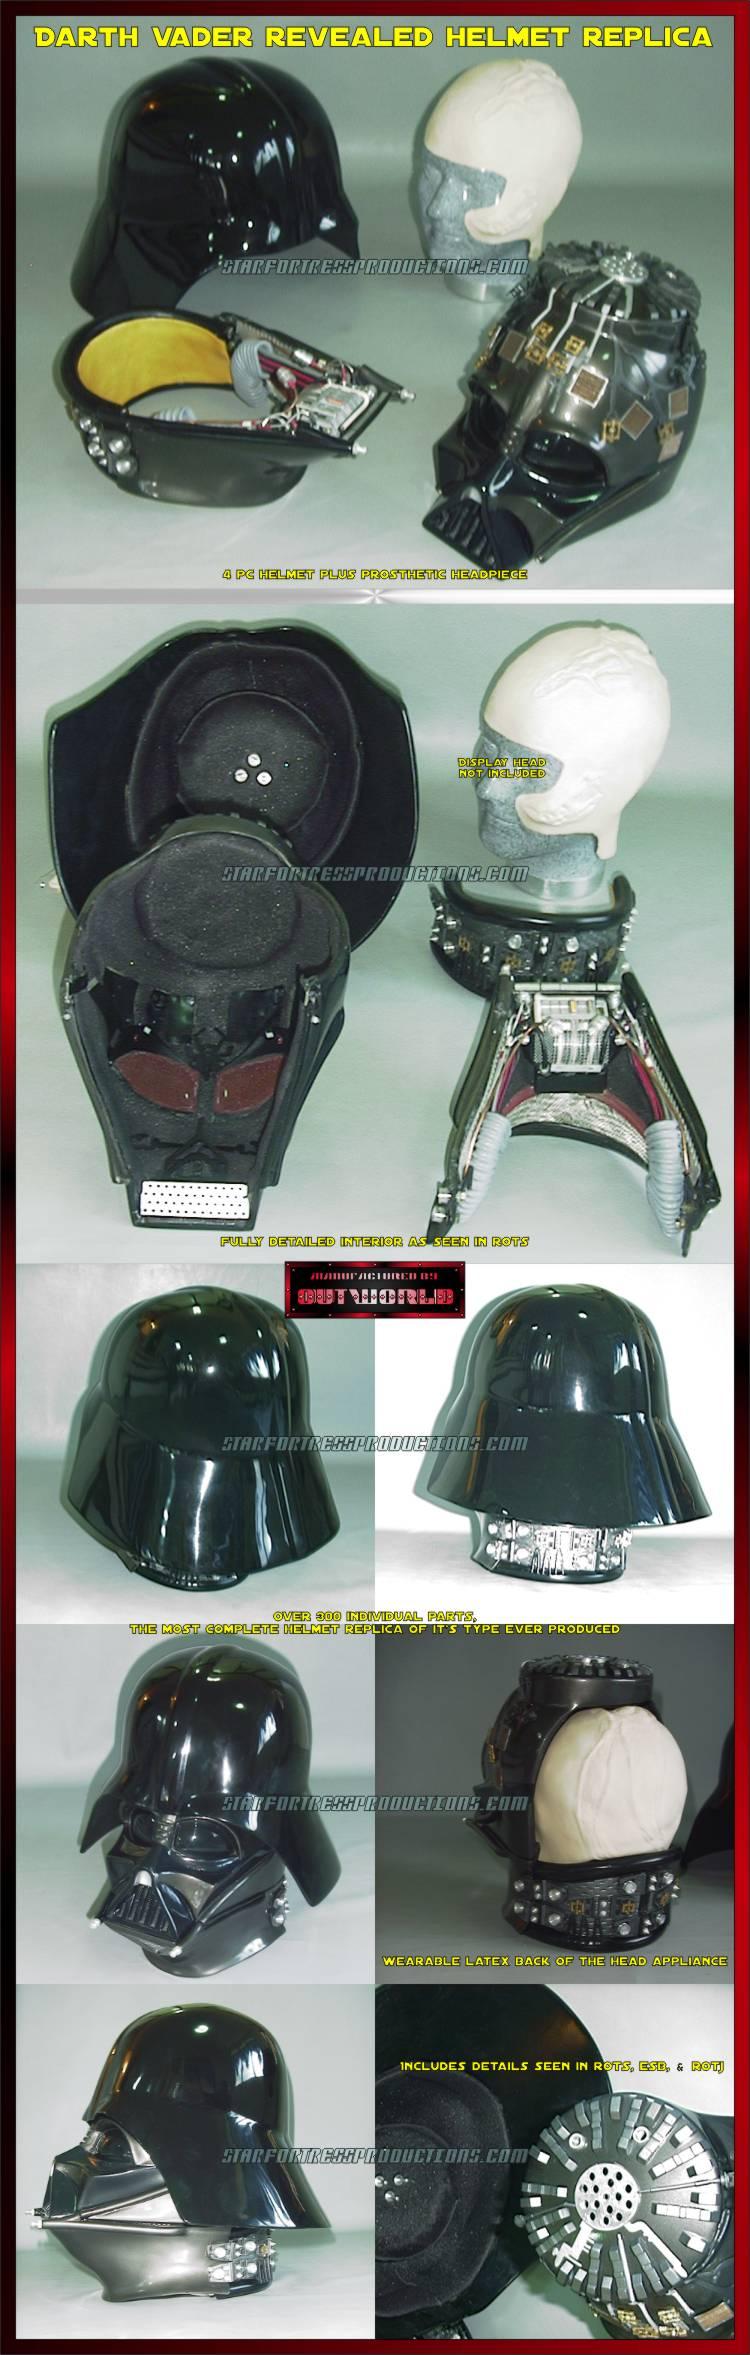 darth-vader-helmet-revealed